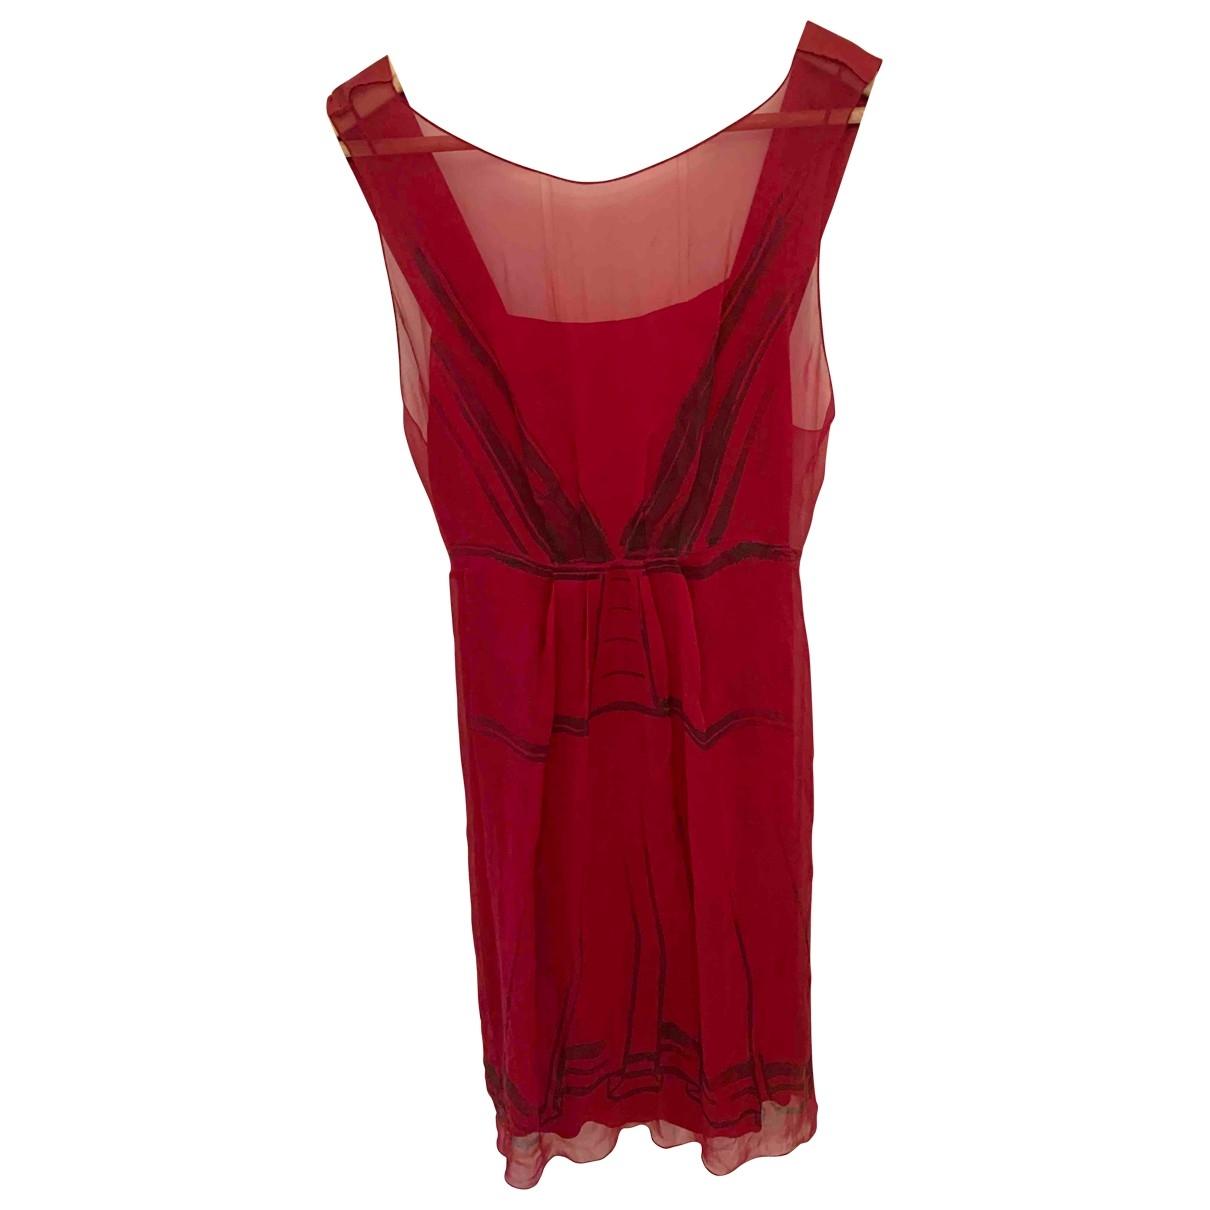 Alberta Ferretti \N Red dress for Women 36 FR